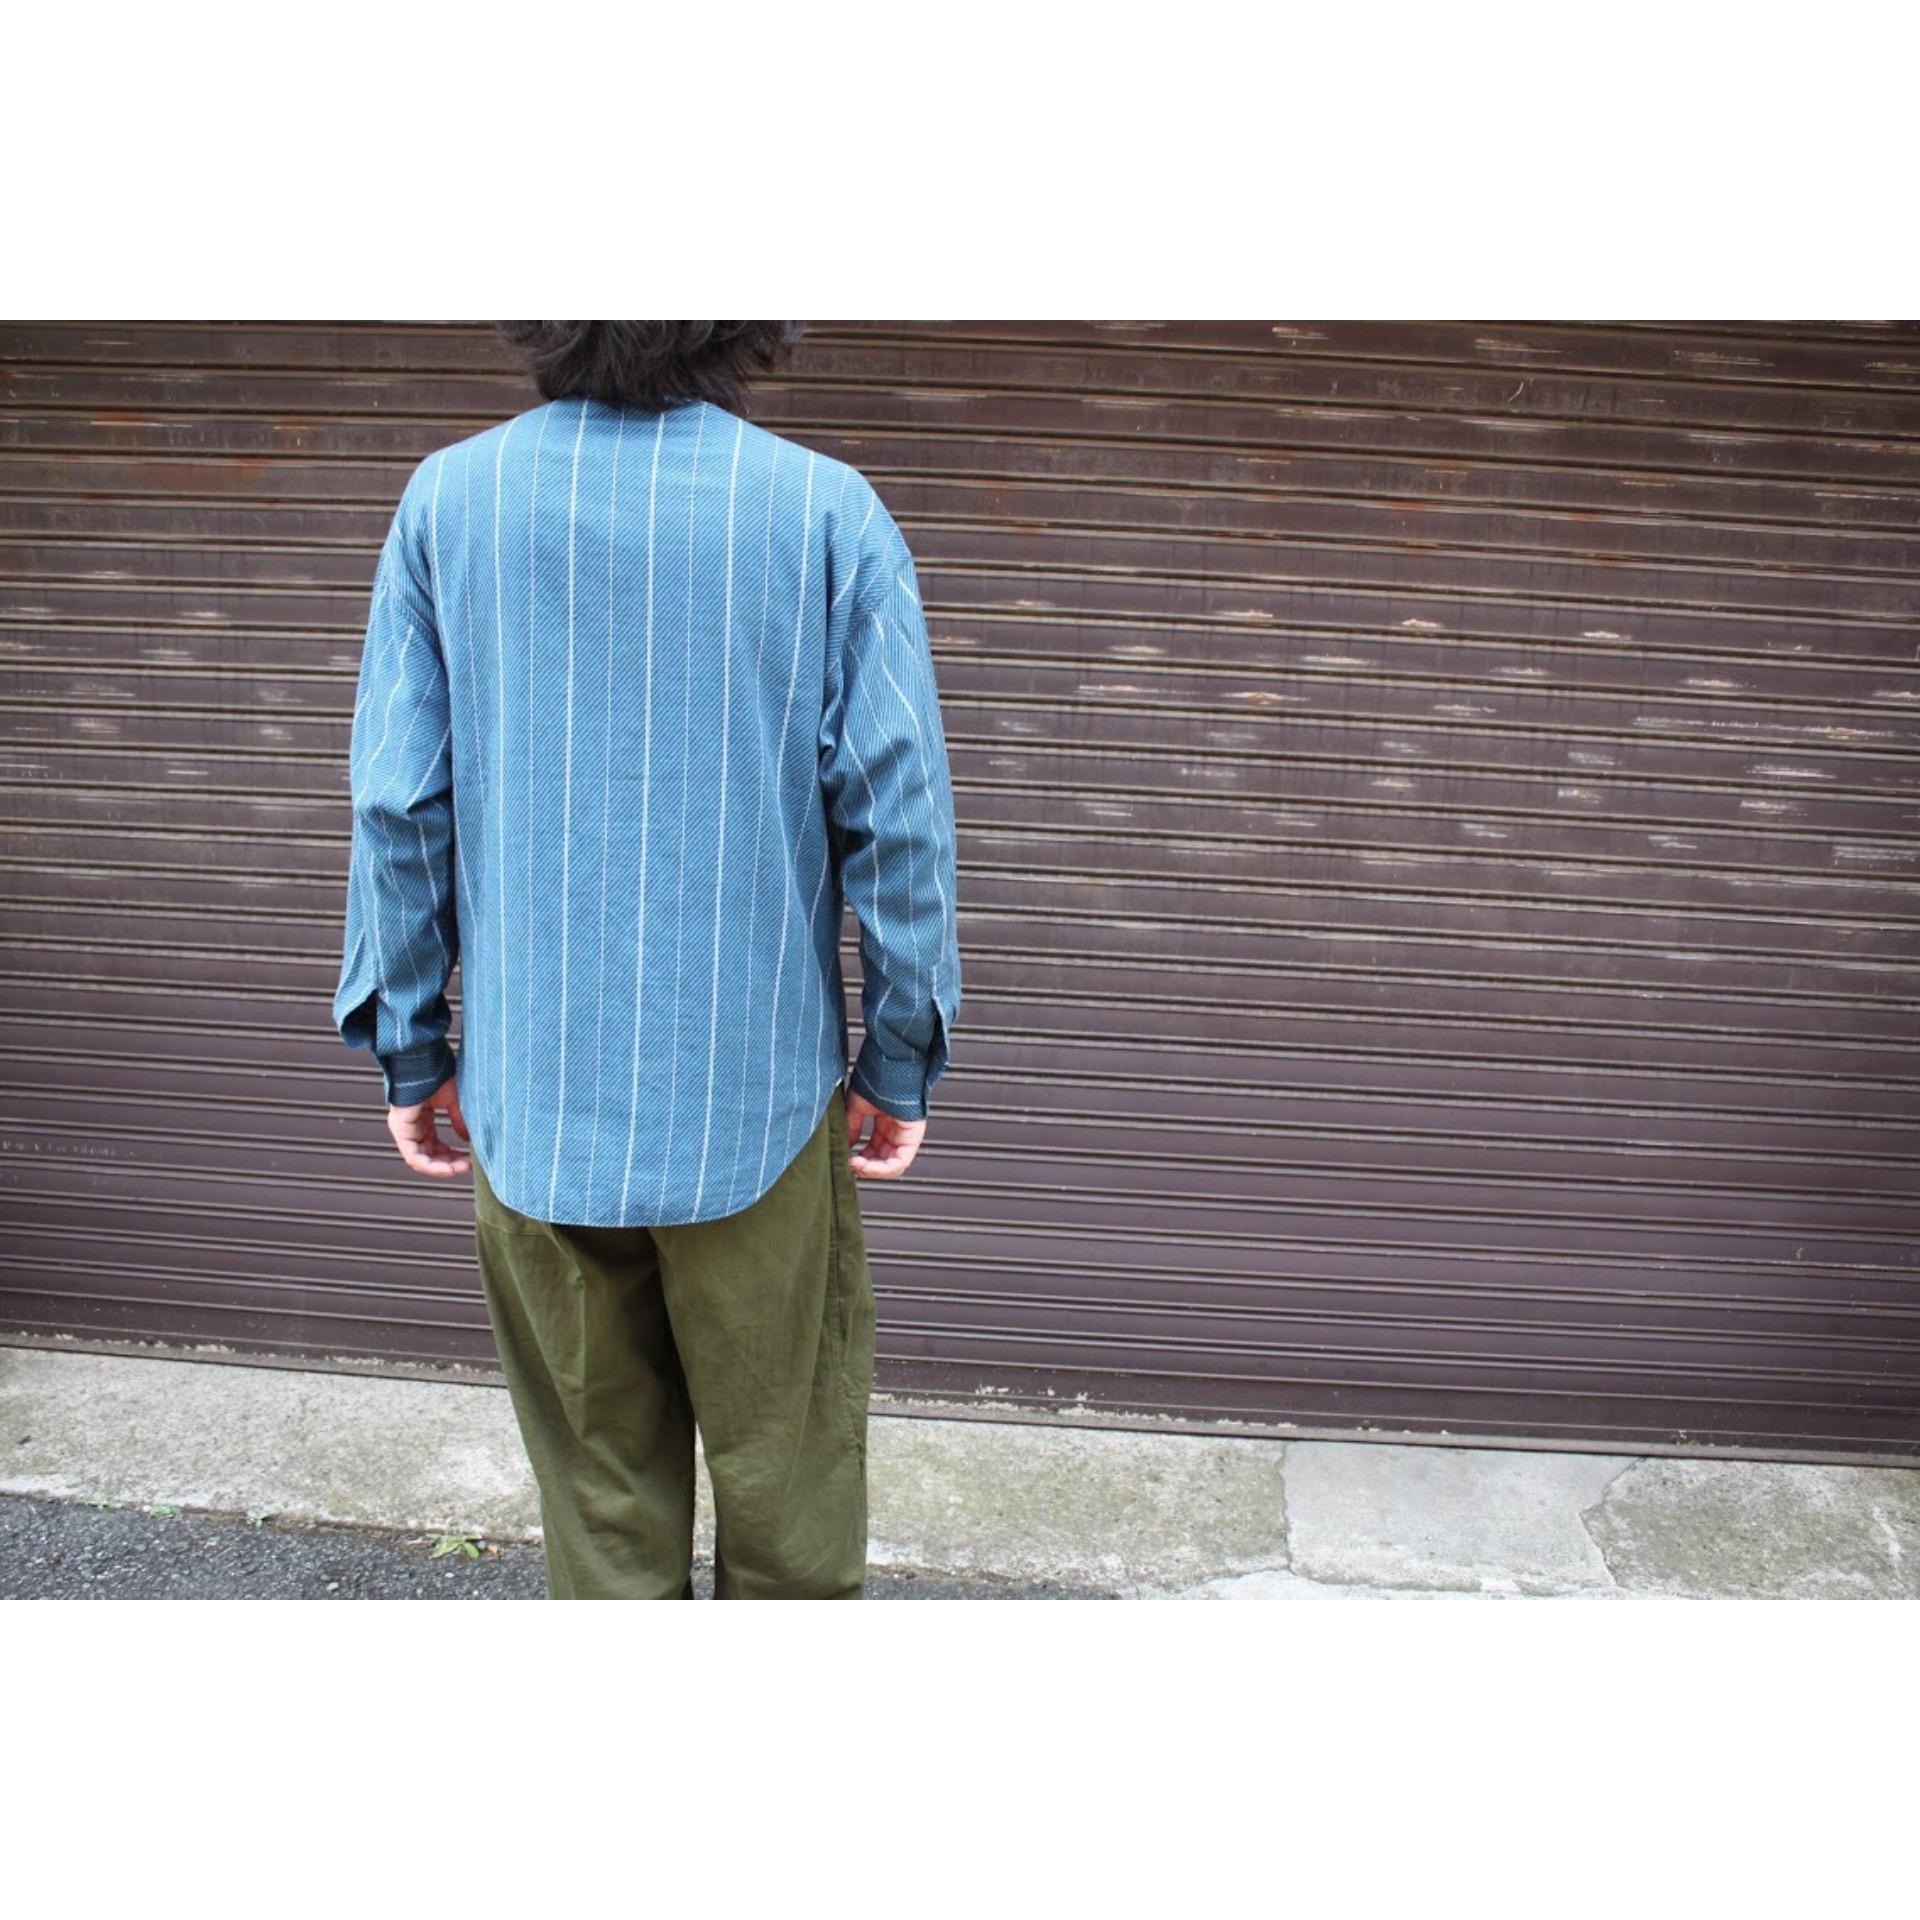 Vintage stripe shirt